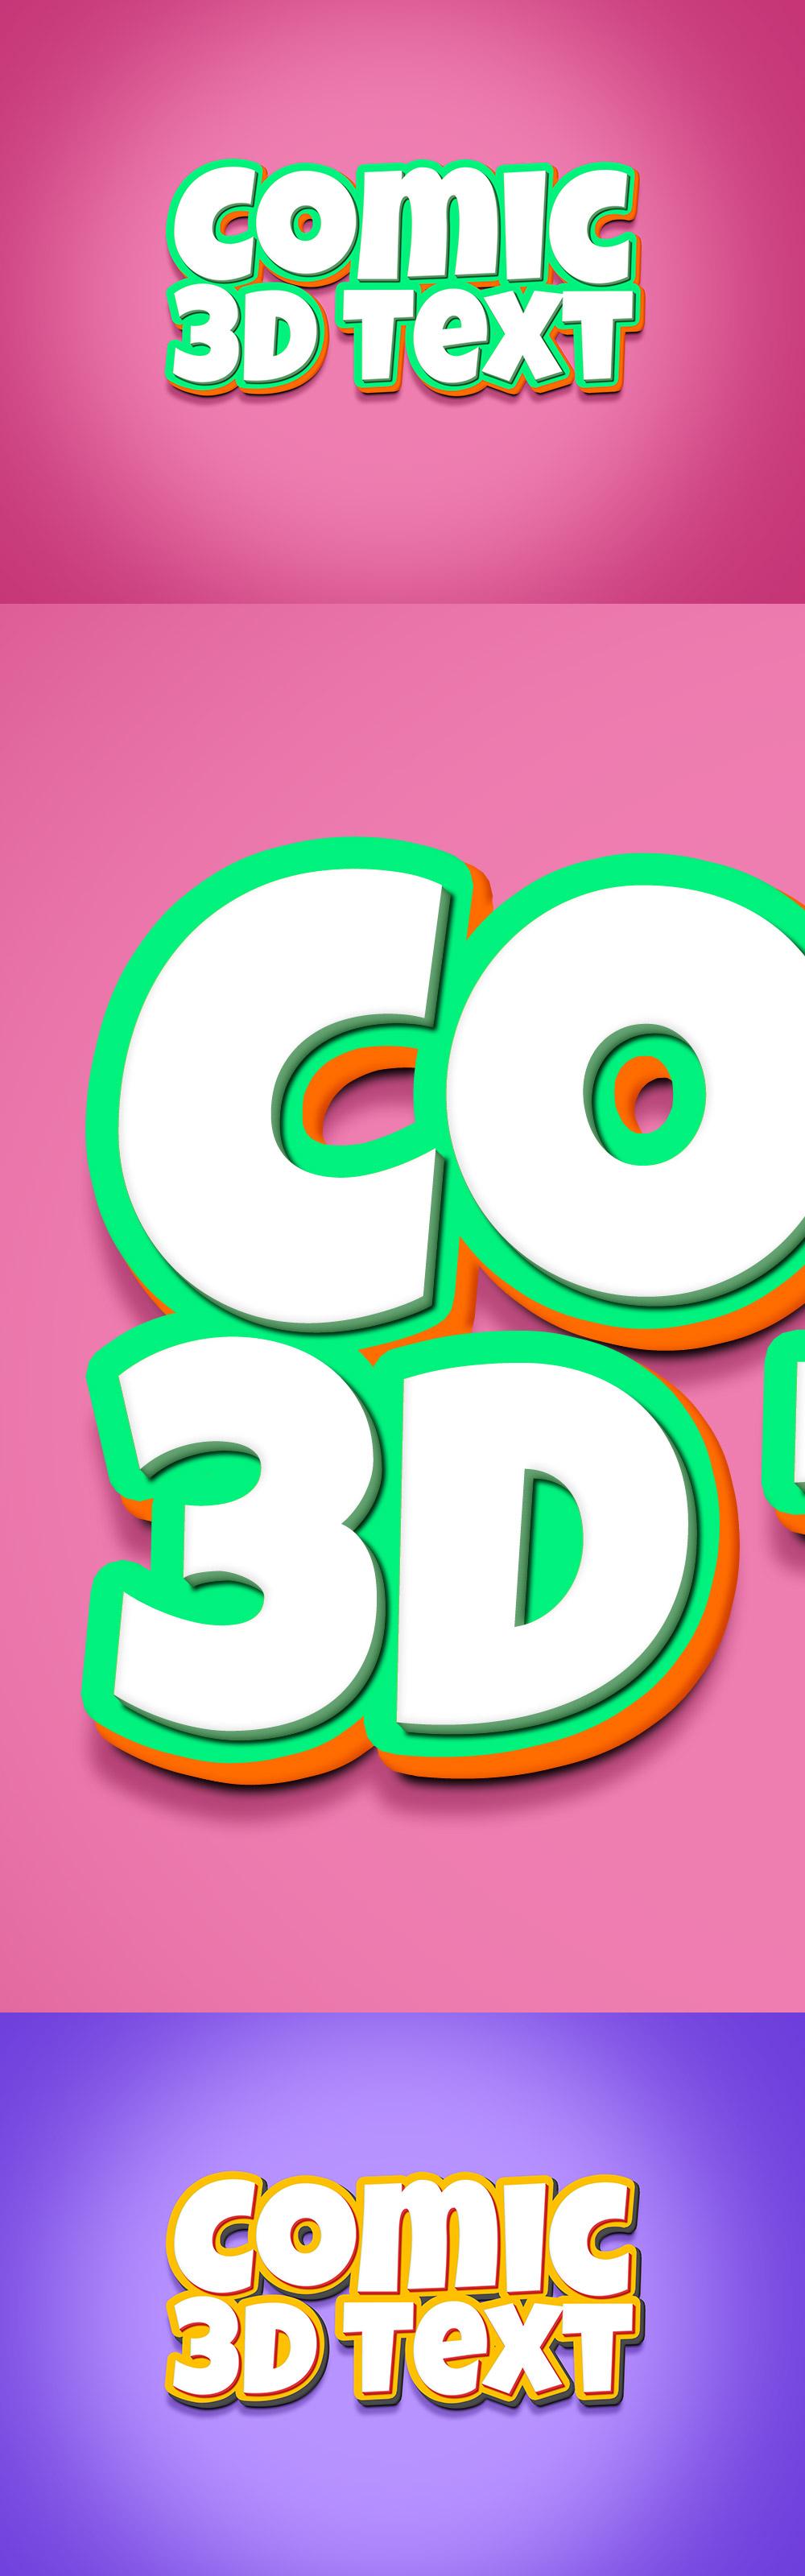 3D Comic Text Effect